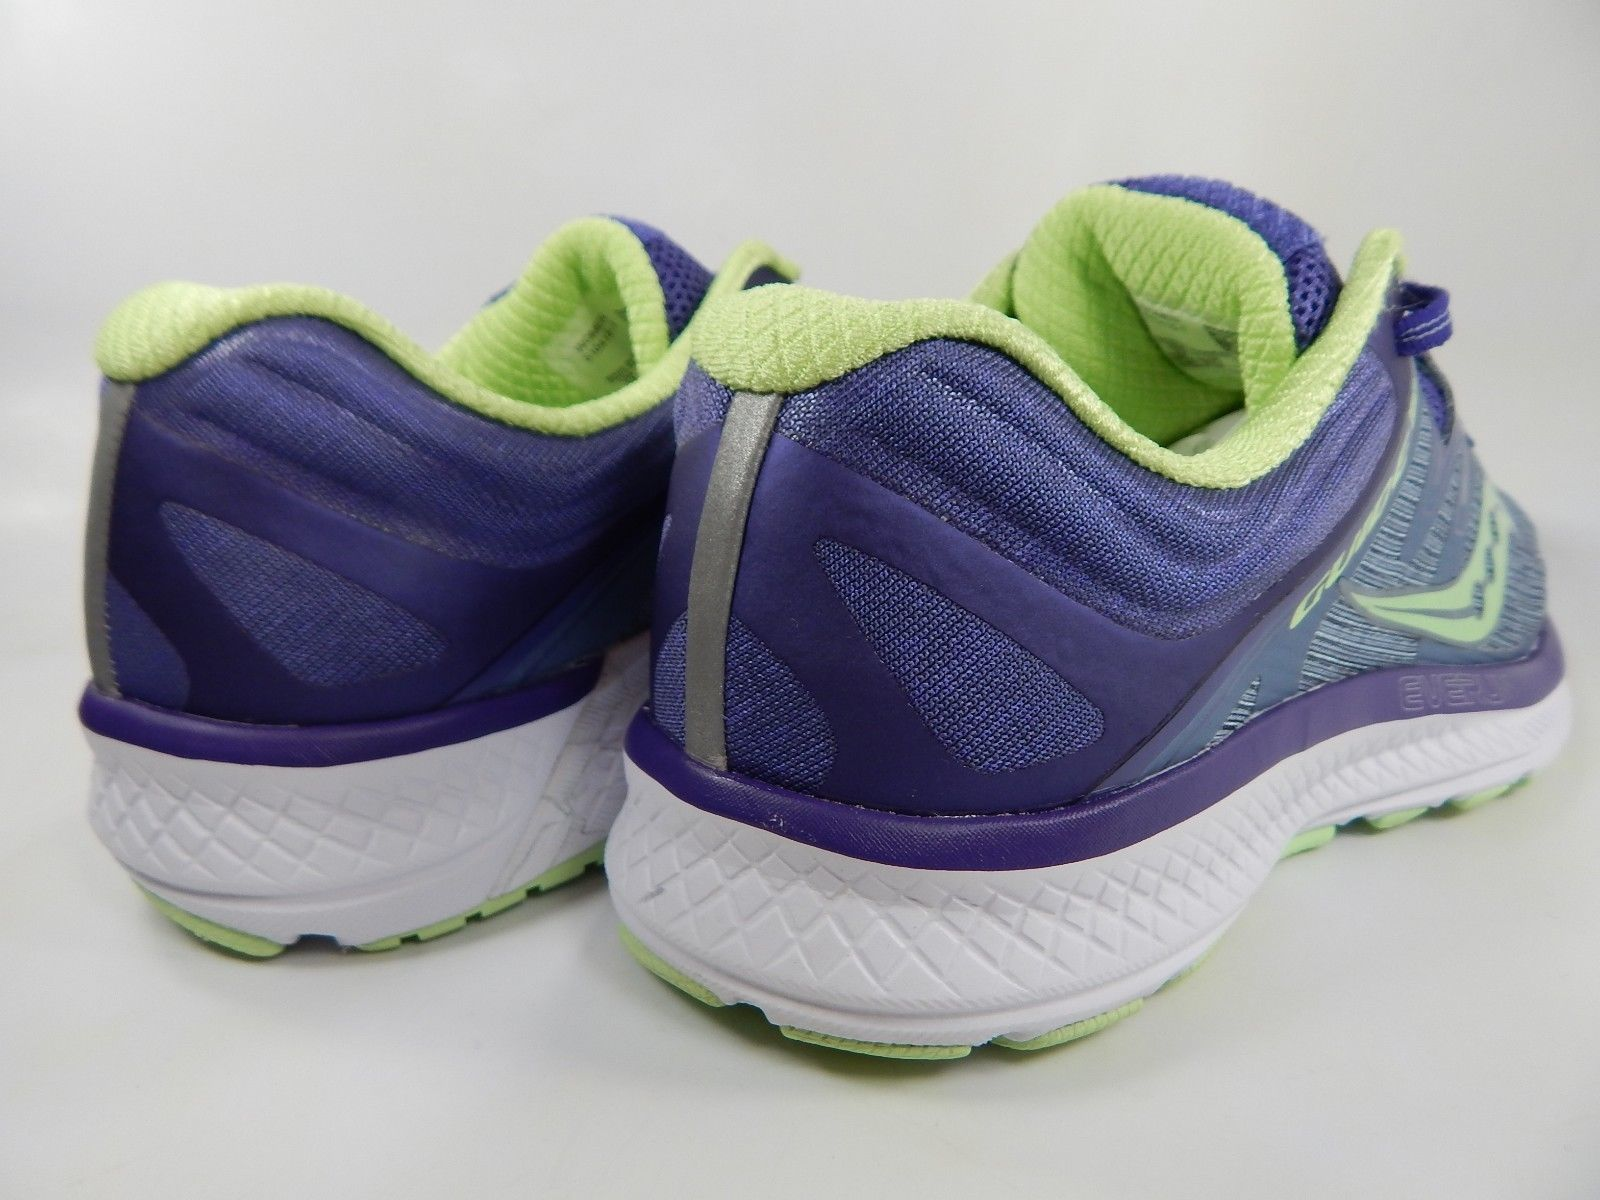 Saucony Guide ISO Size 9.5 M (B) EU: 41 Women's Running Shoes Purple S10415-1